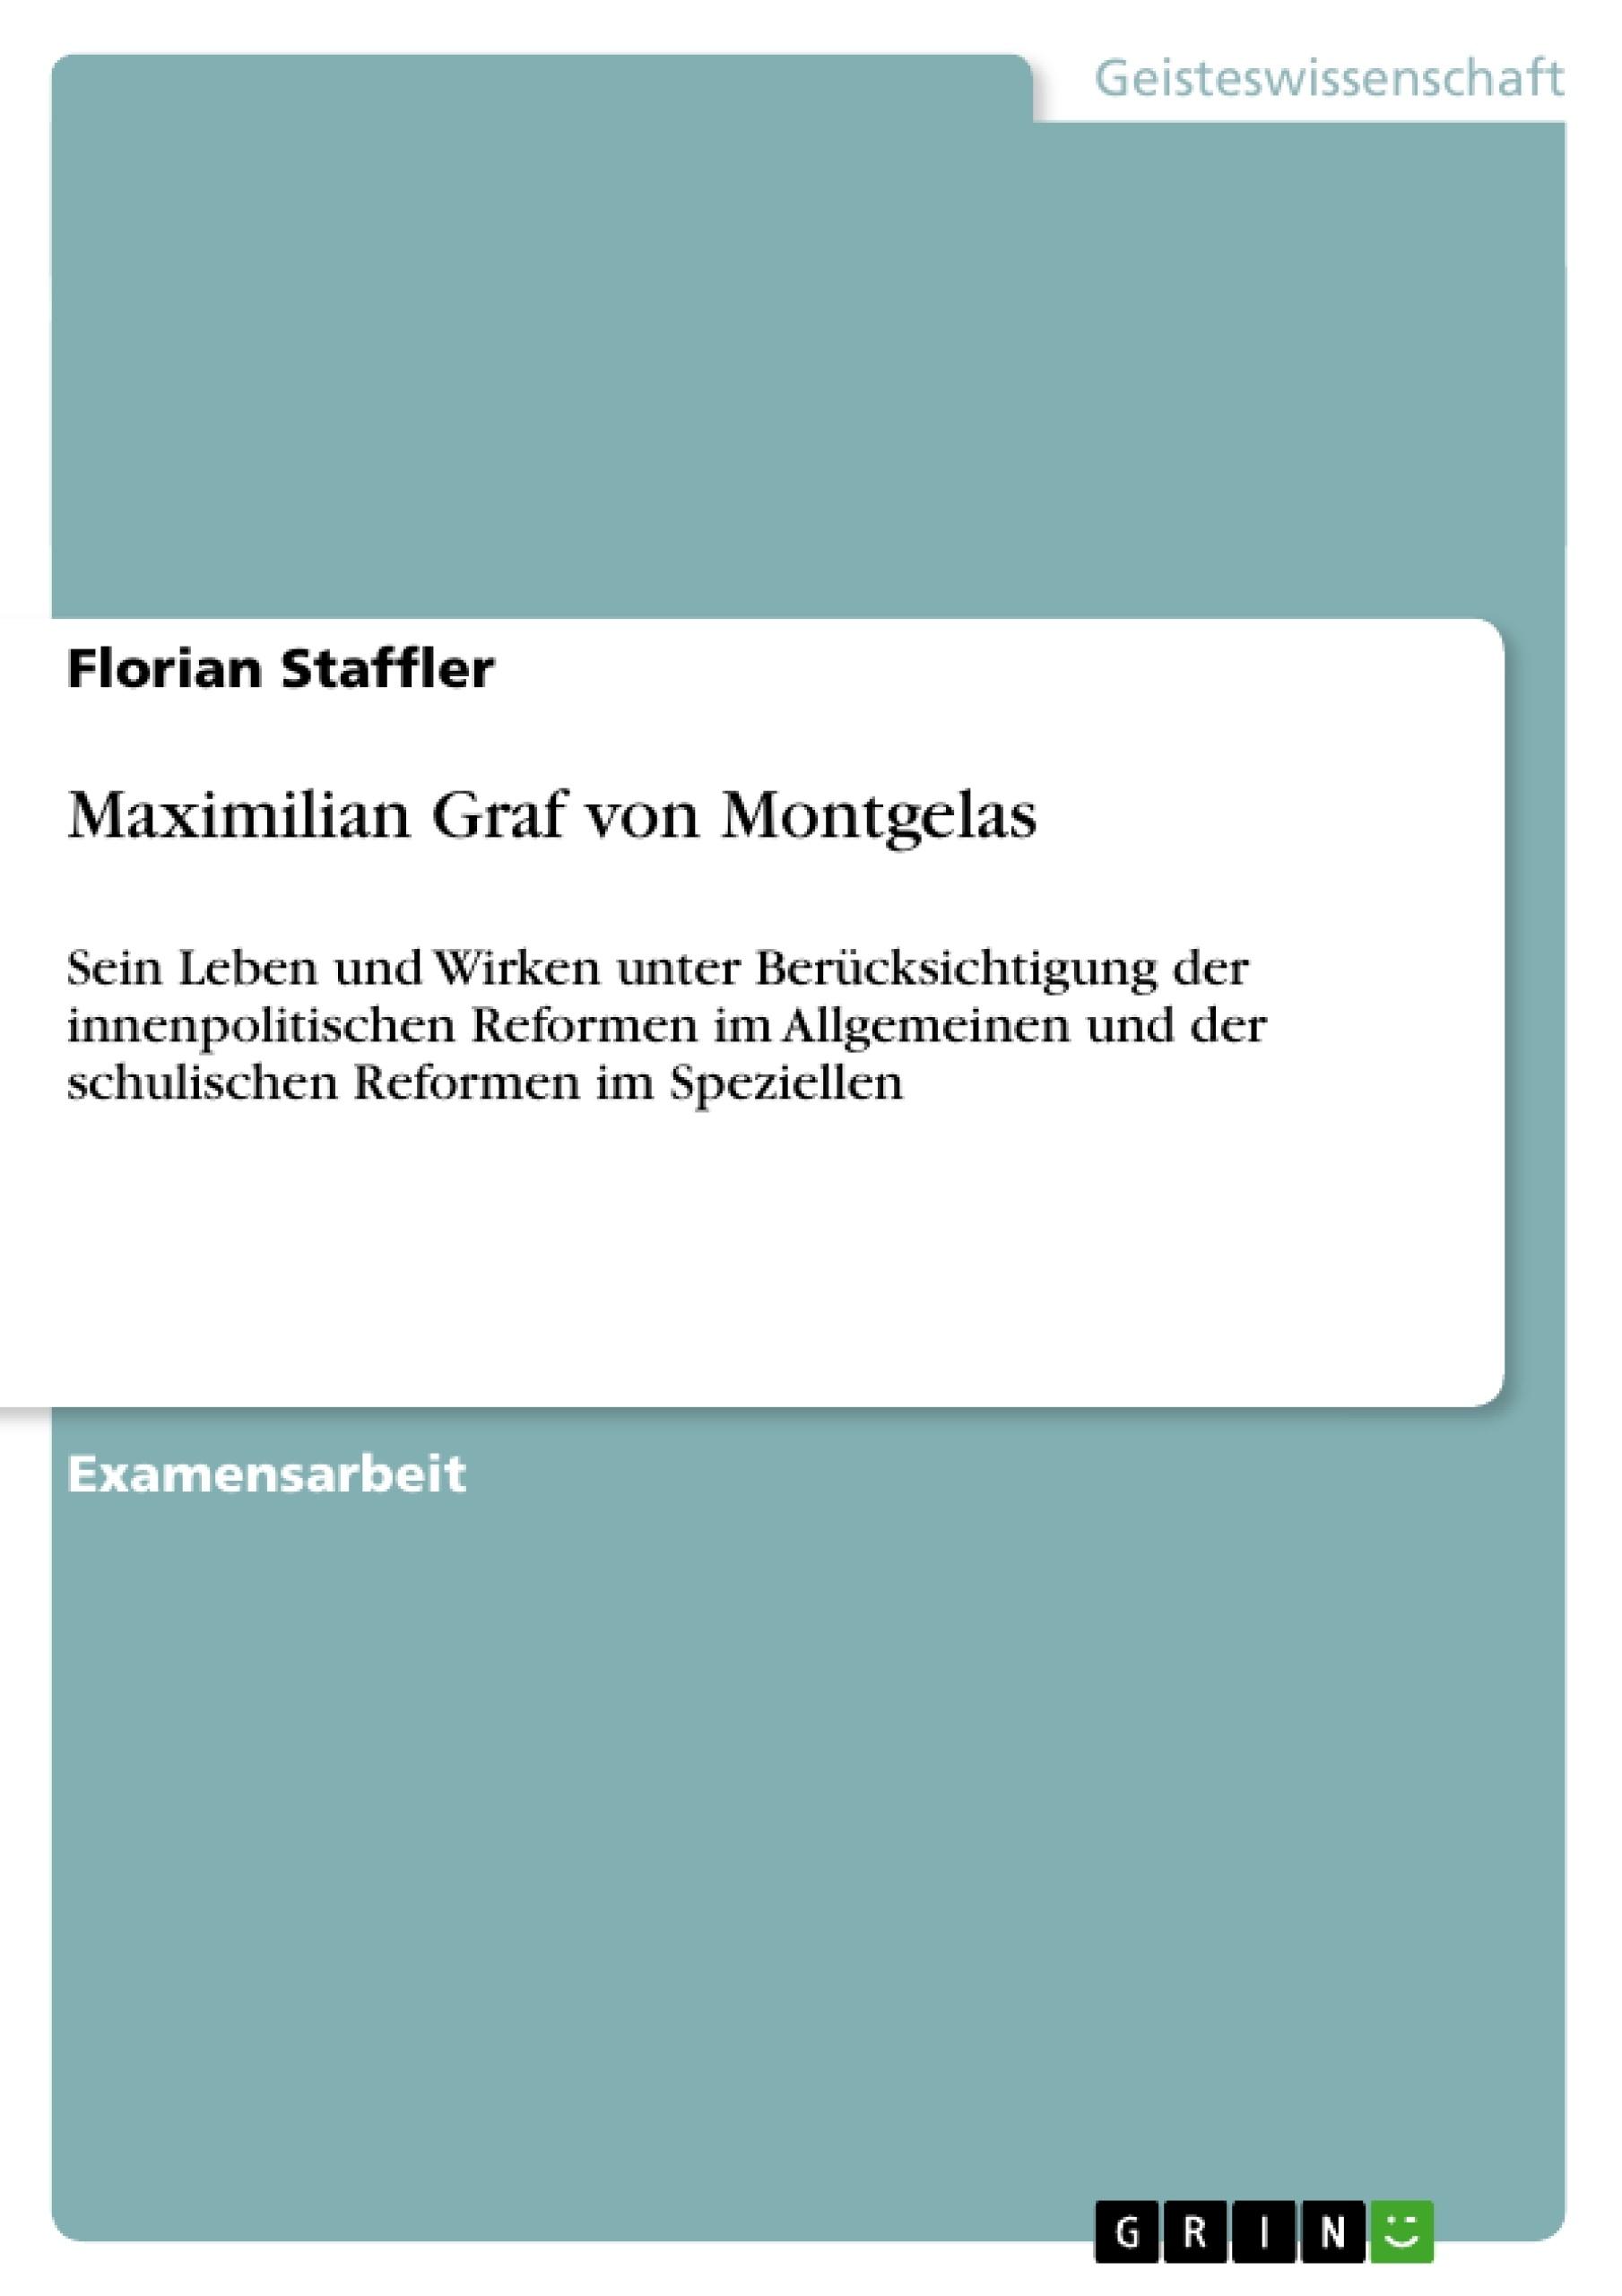 Titel: Maximilian Graf von Montgelas